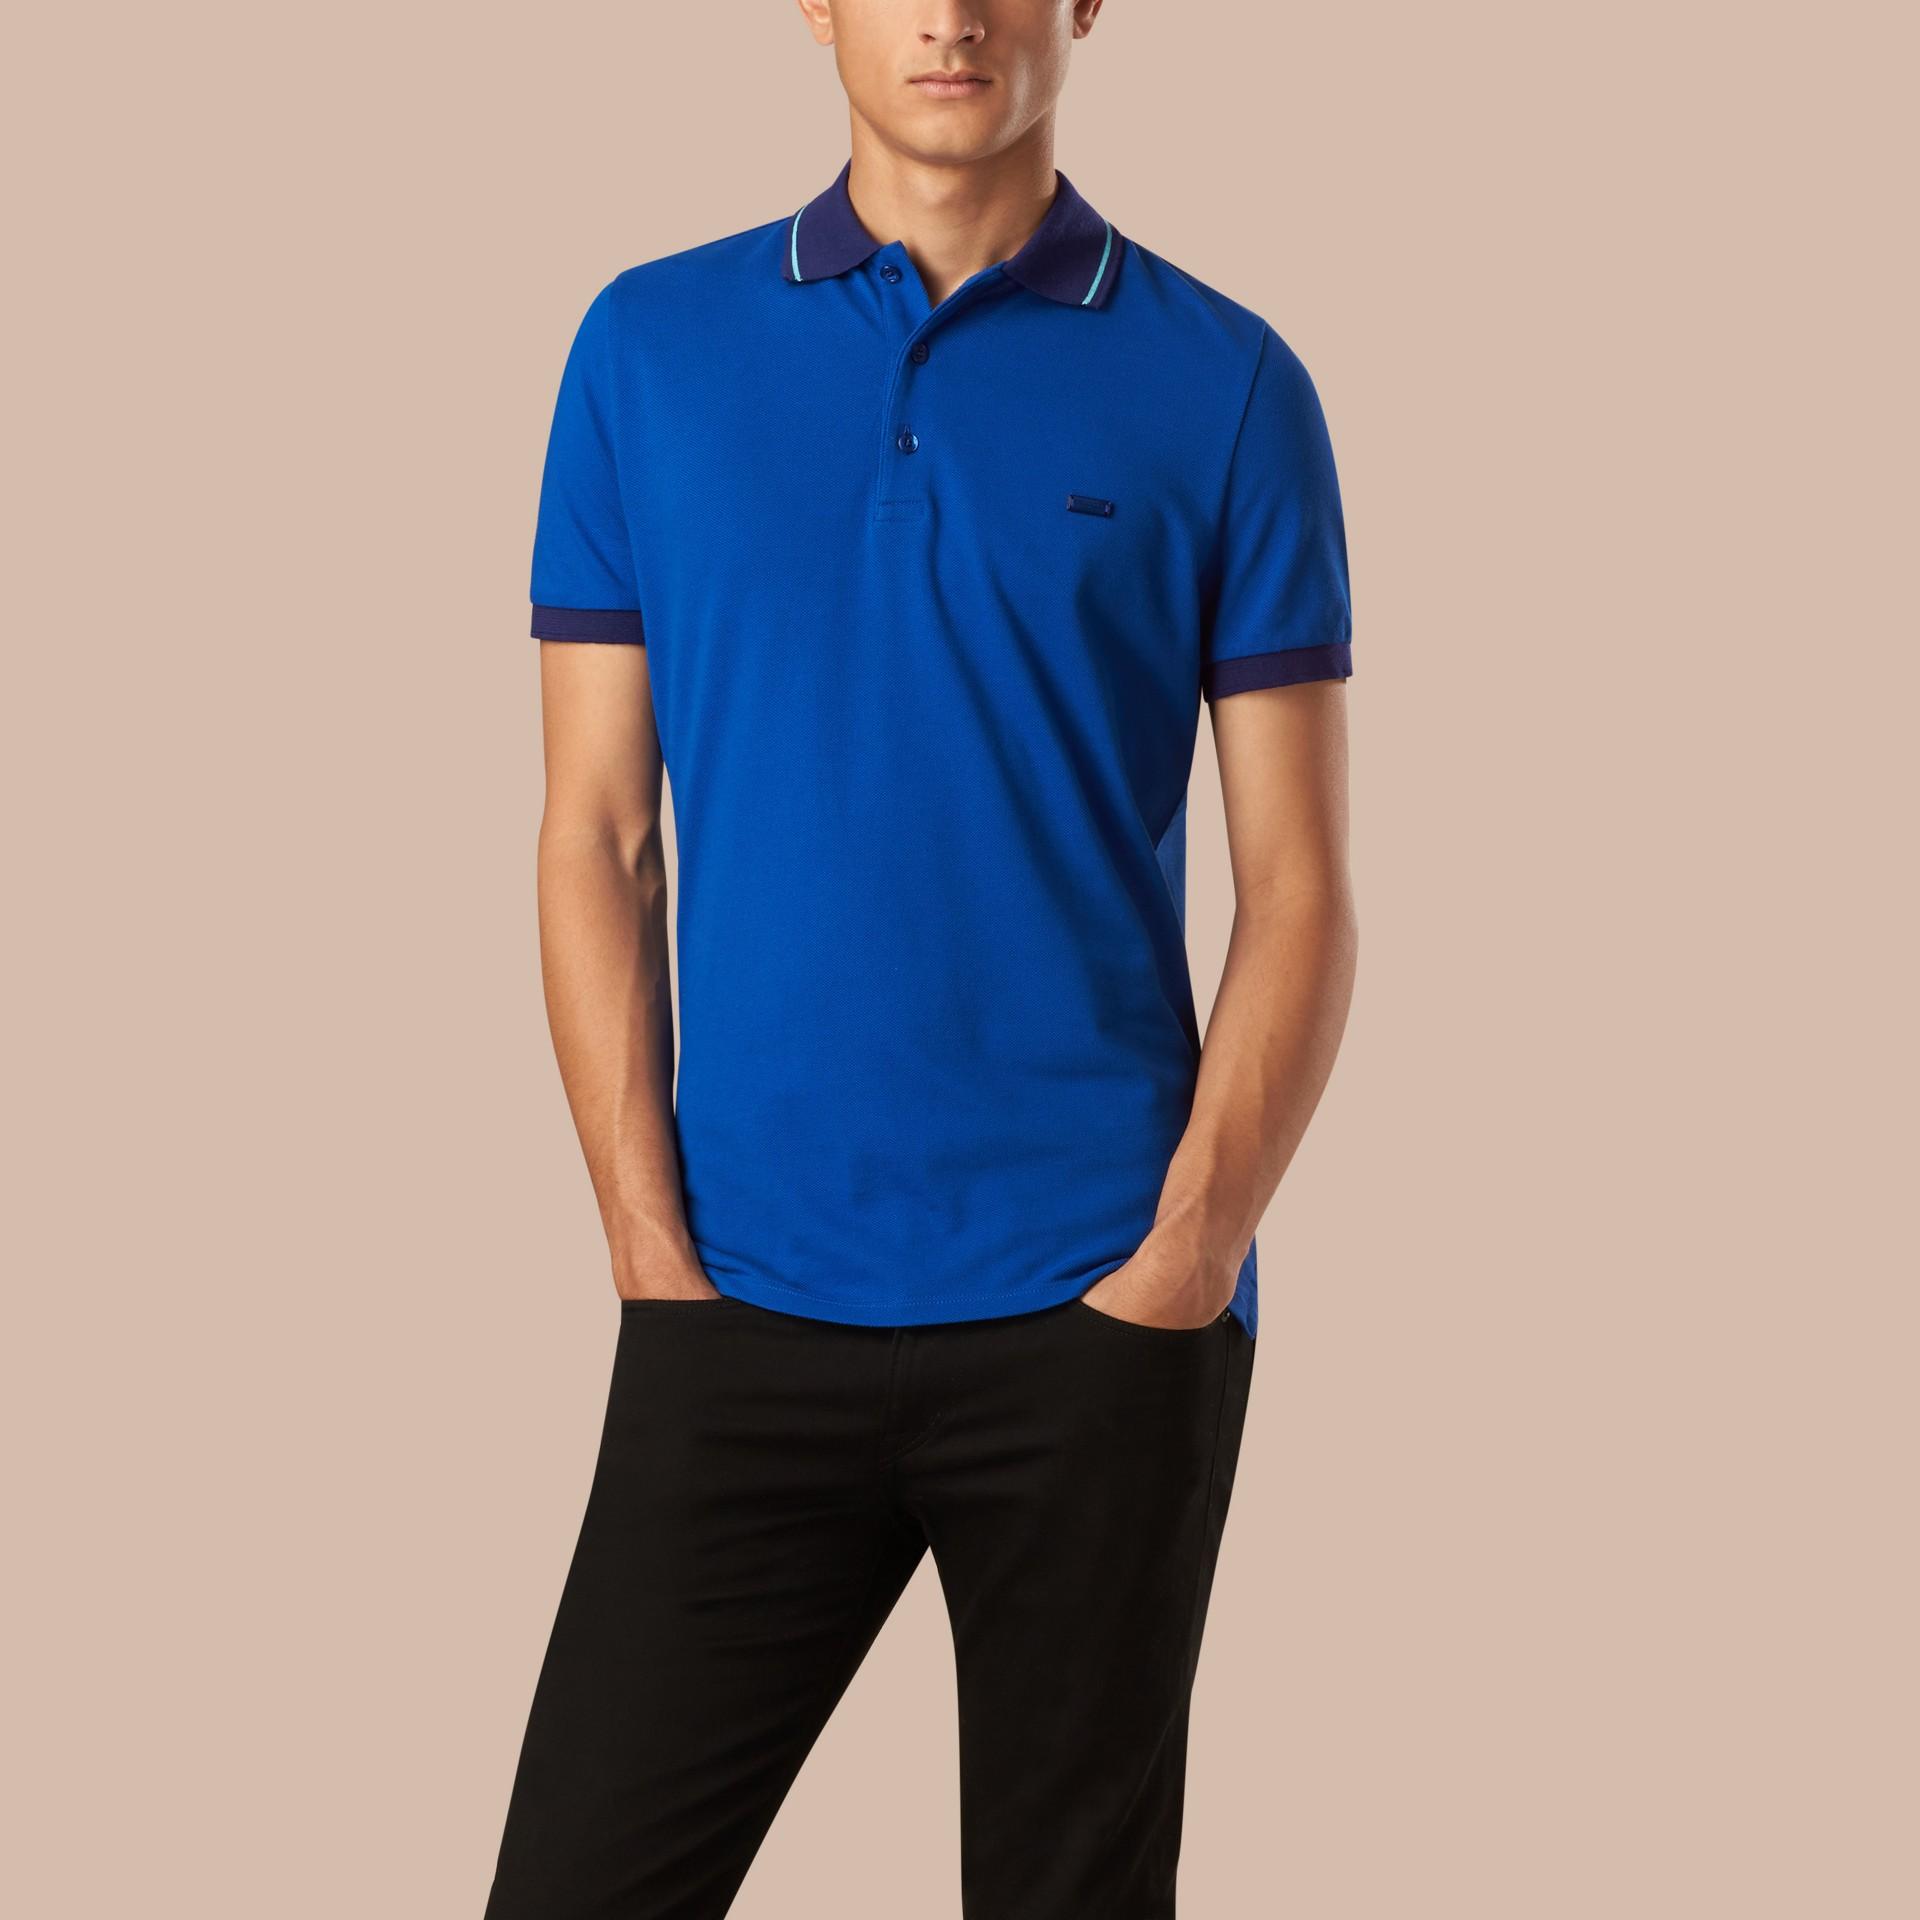 Kobaltblau/helles peridotblau Poloshirt aus Baumwollpiqué mit Kontrastbesatz Kobaltblau/helles Peridotblau - Galerie-Bild 1